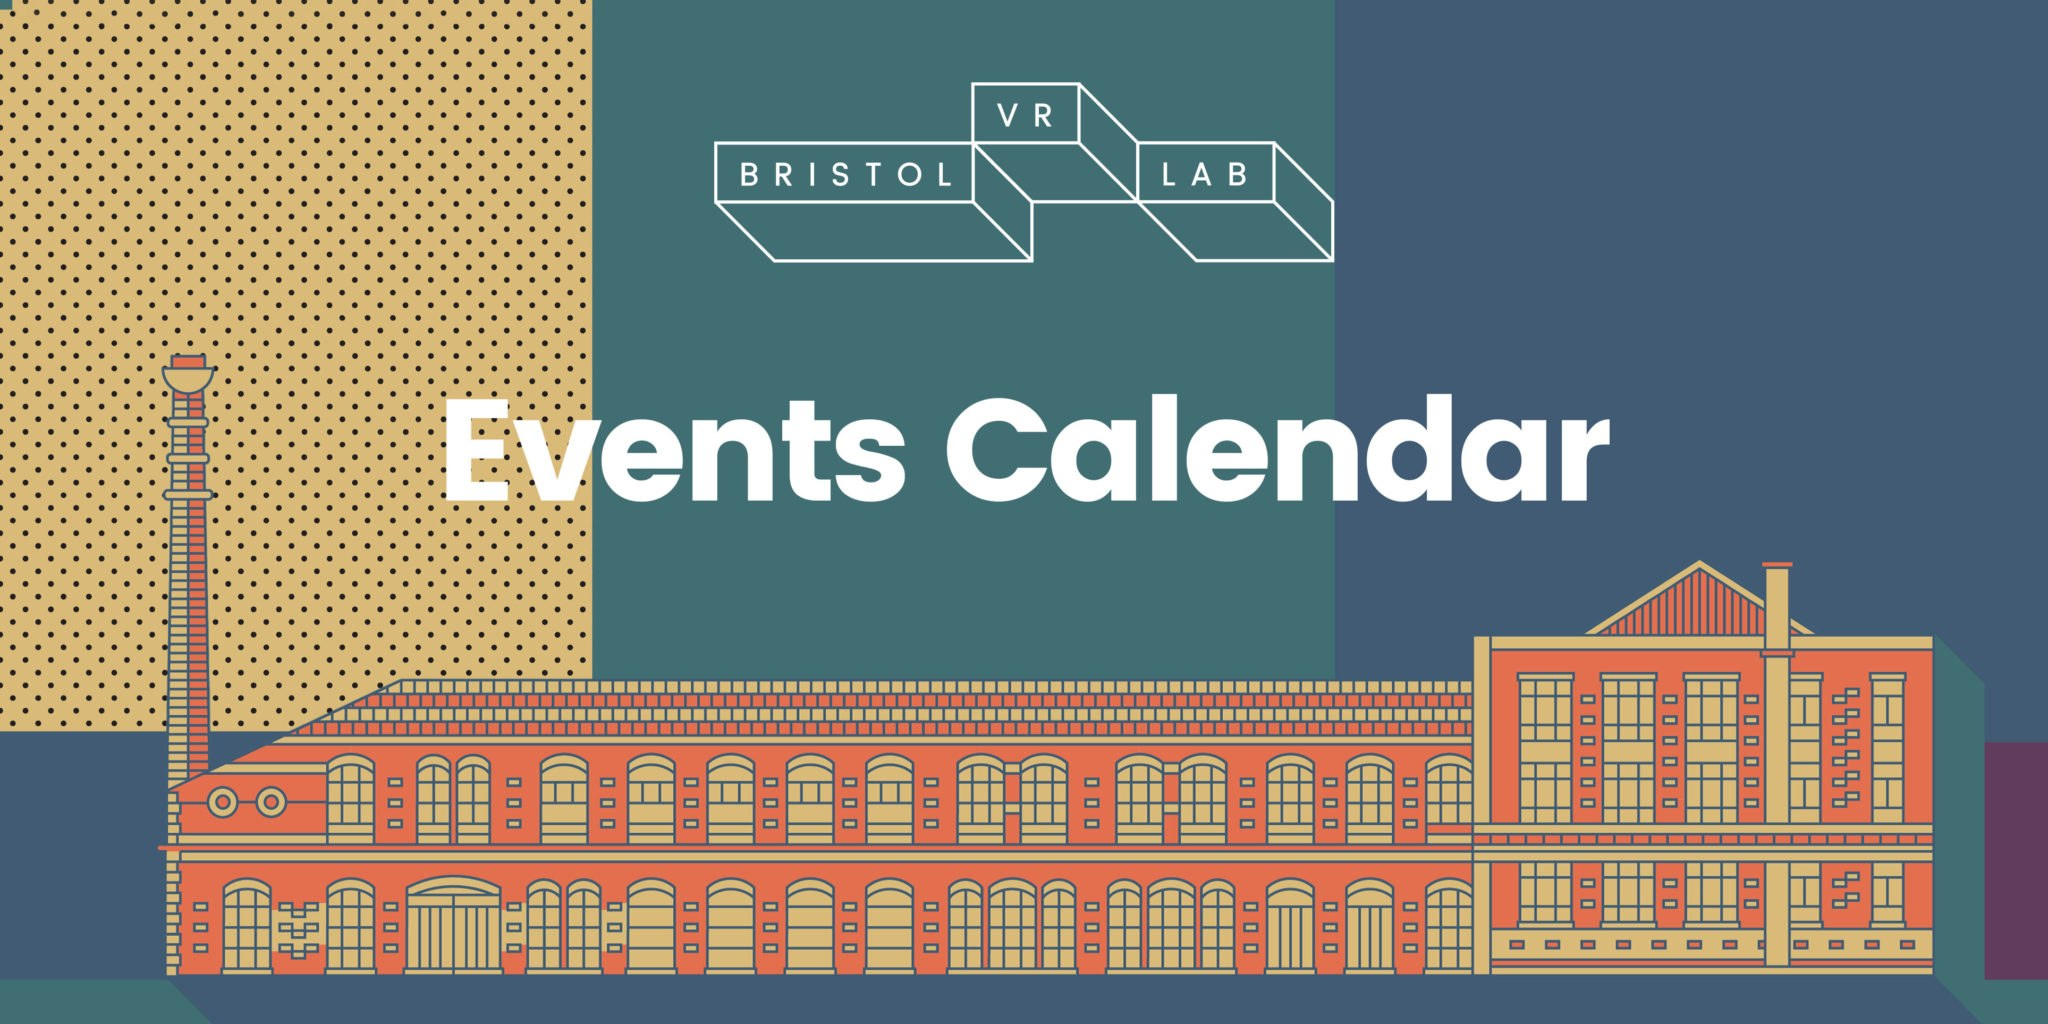 Bristol VR Lab 2018 Events Calendar